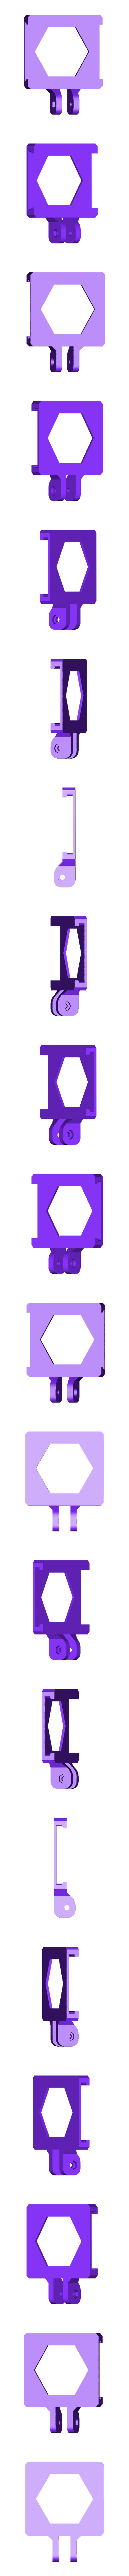 Anycubic_Mega-S_Raspberry_Cam_Support_v1_v3.stl Download free STL file Anycubic I3 Mega Raspberry Pi Camera Mount - Remix • Design to 3D print, nik101968